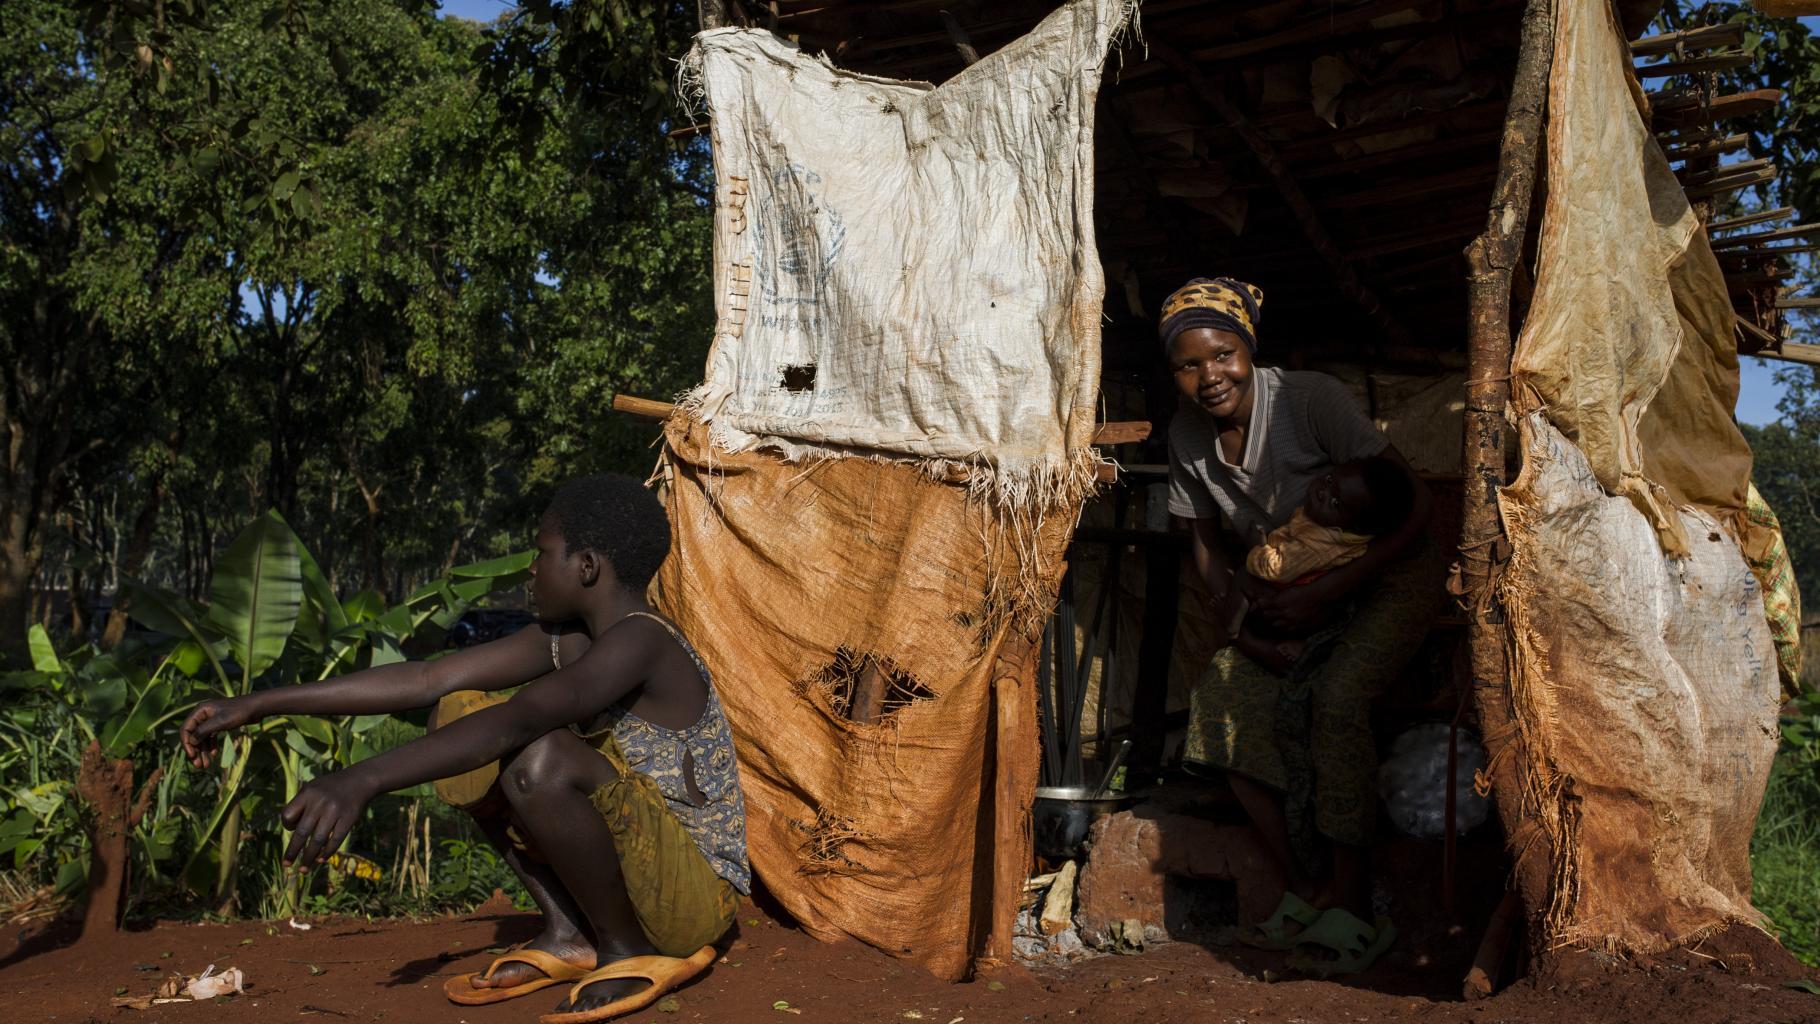 Mutter und Sohn im Nyarugusu Flüchtlingscamp in Tansania